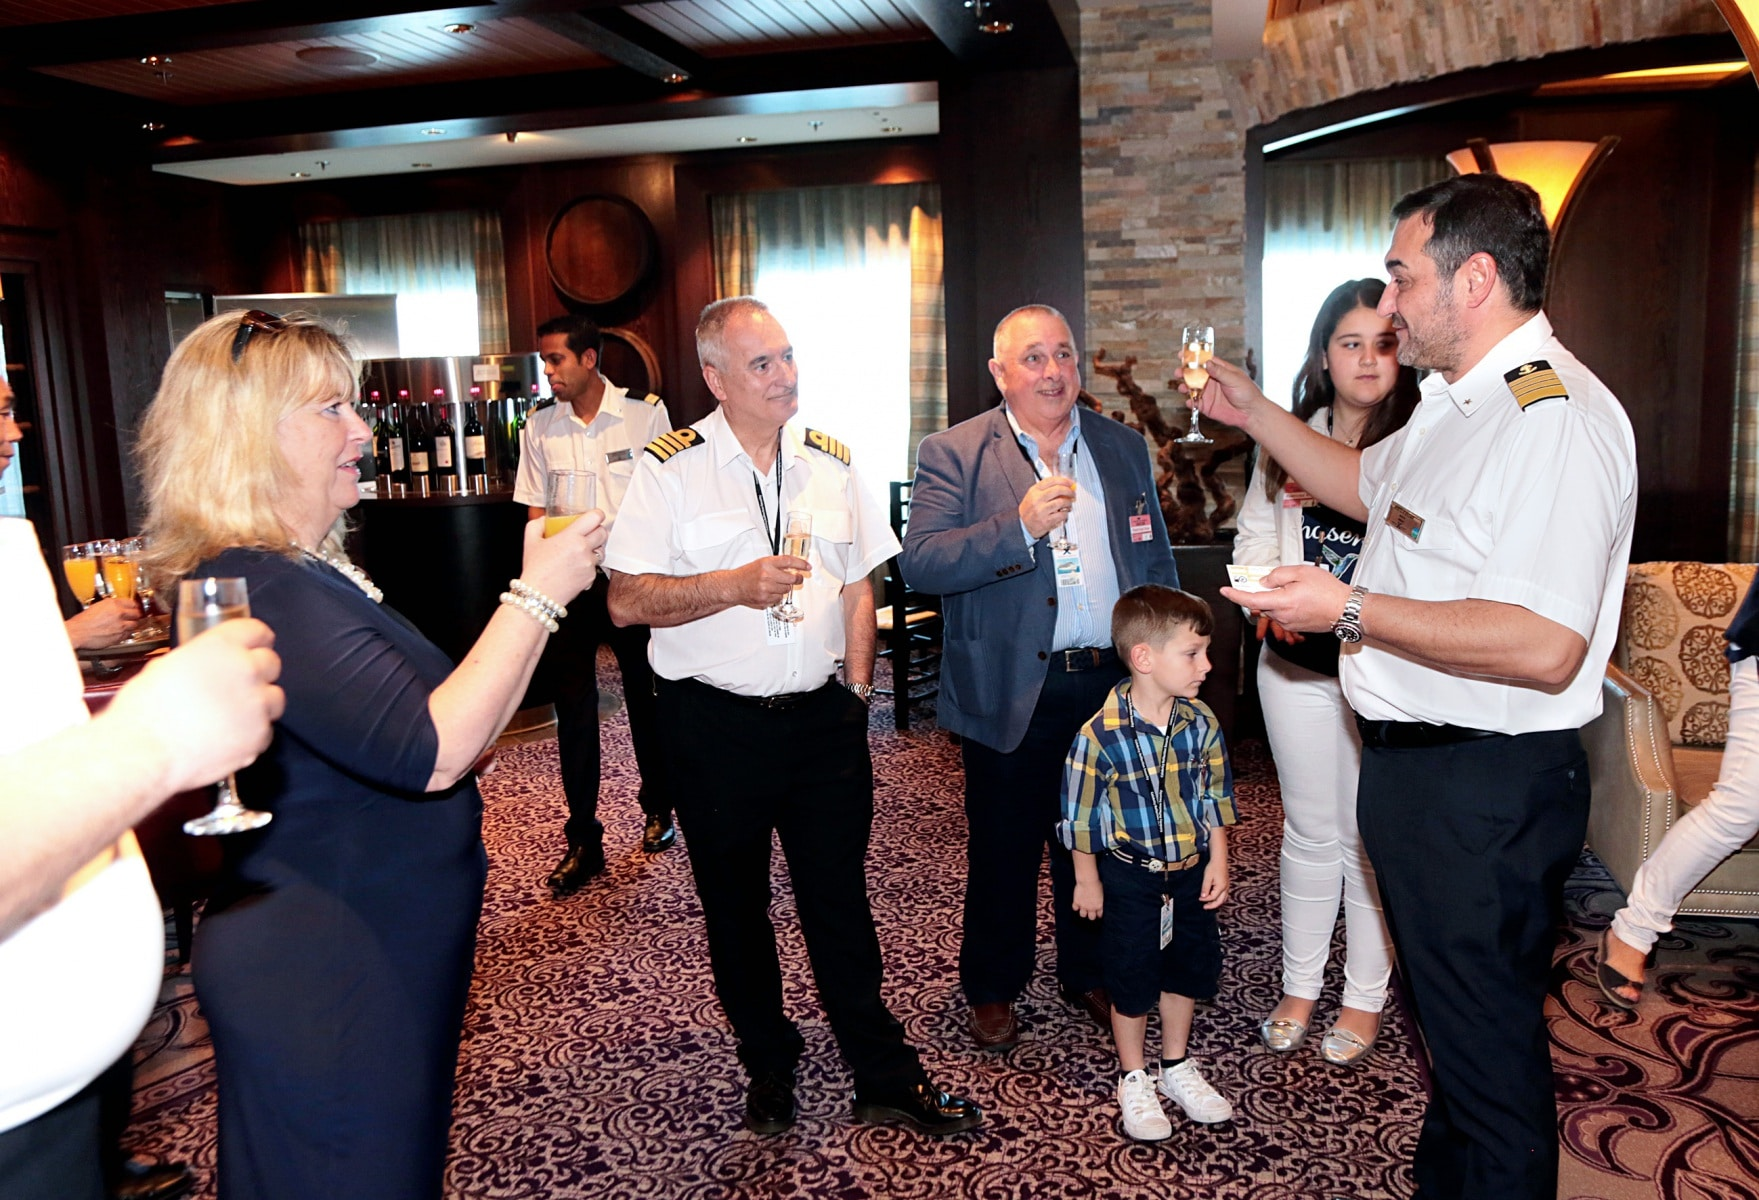 08-may-2017-32visita-inaugural-del-crucero-celebrity-or-reflection-a-gibraltar_34606278401_o